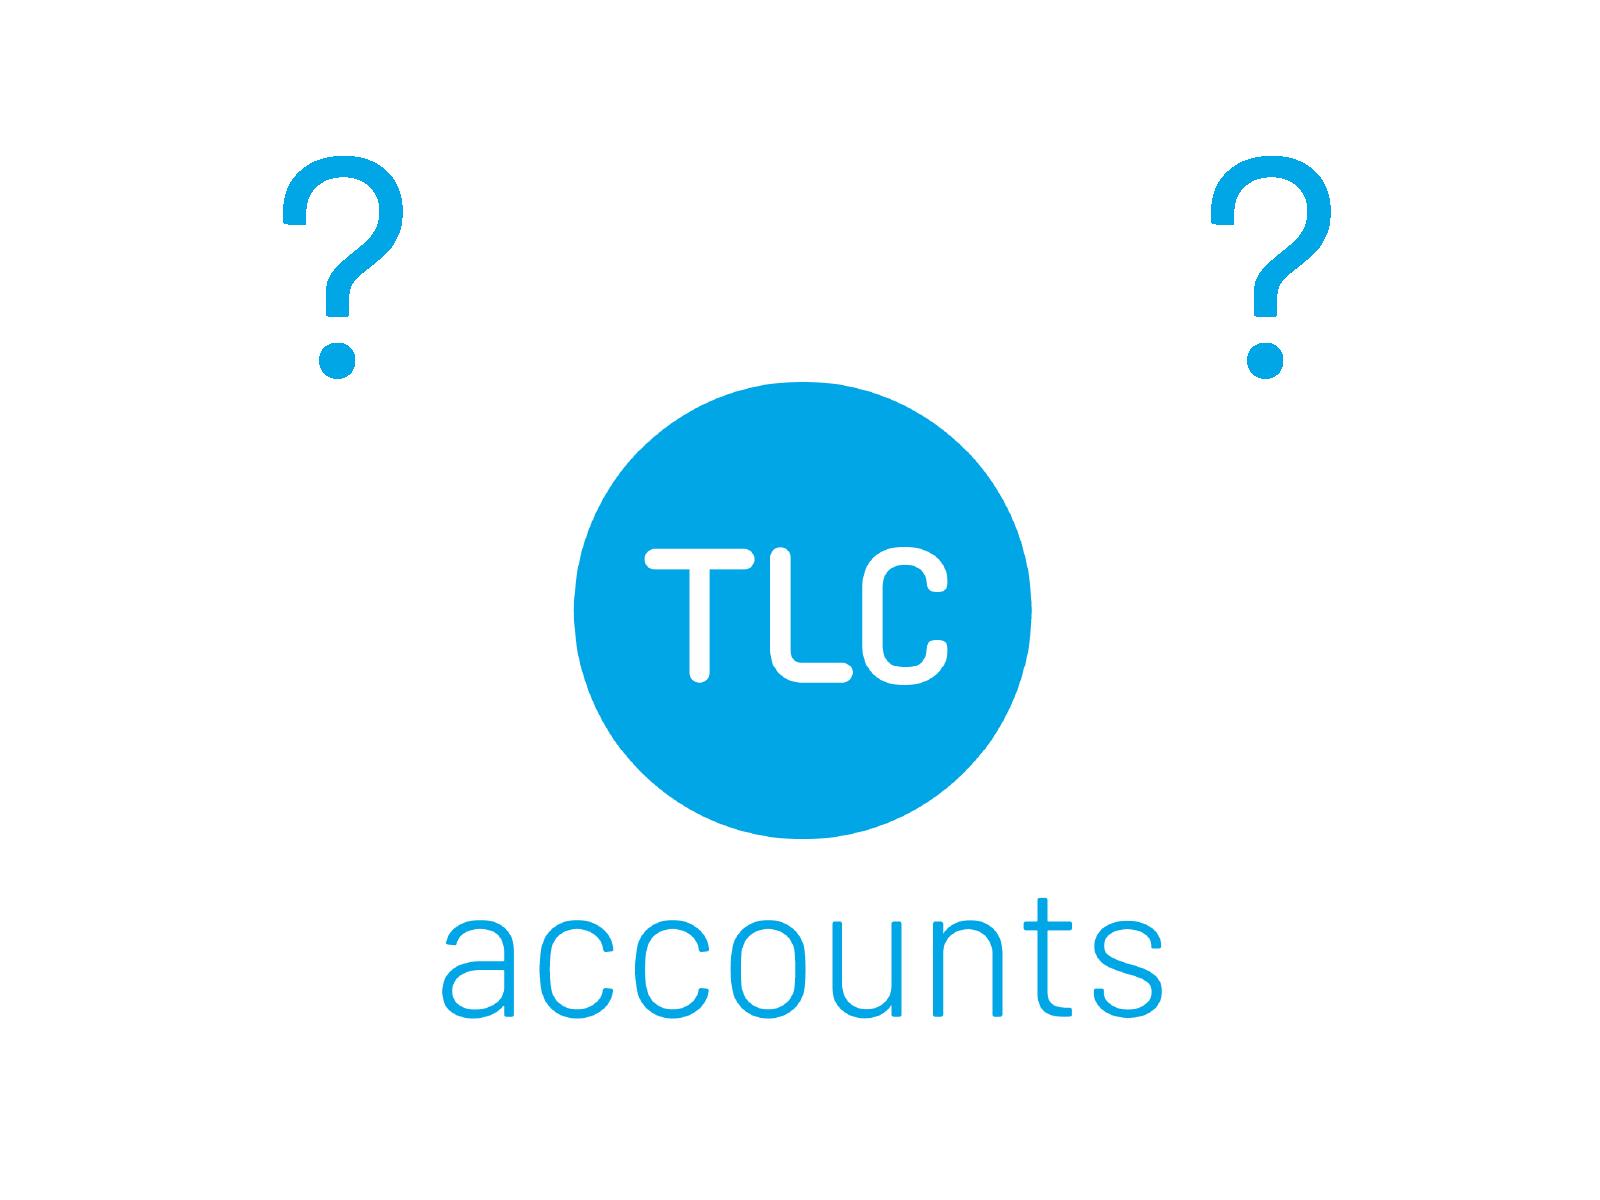 TLC accounts business name blog